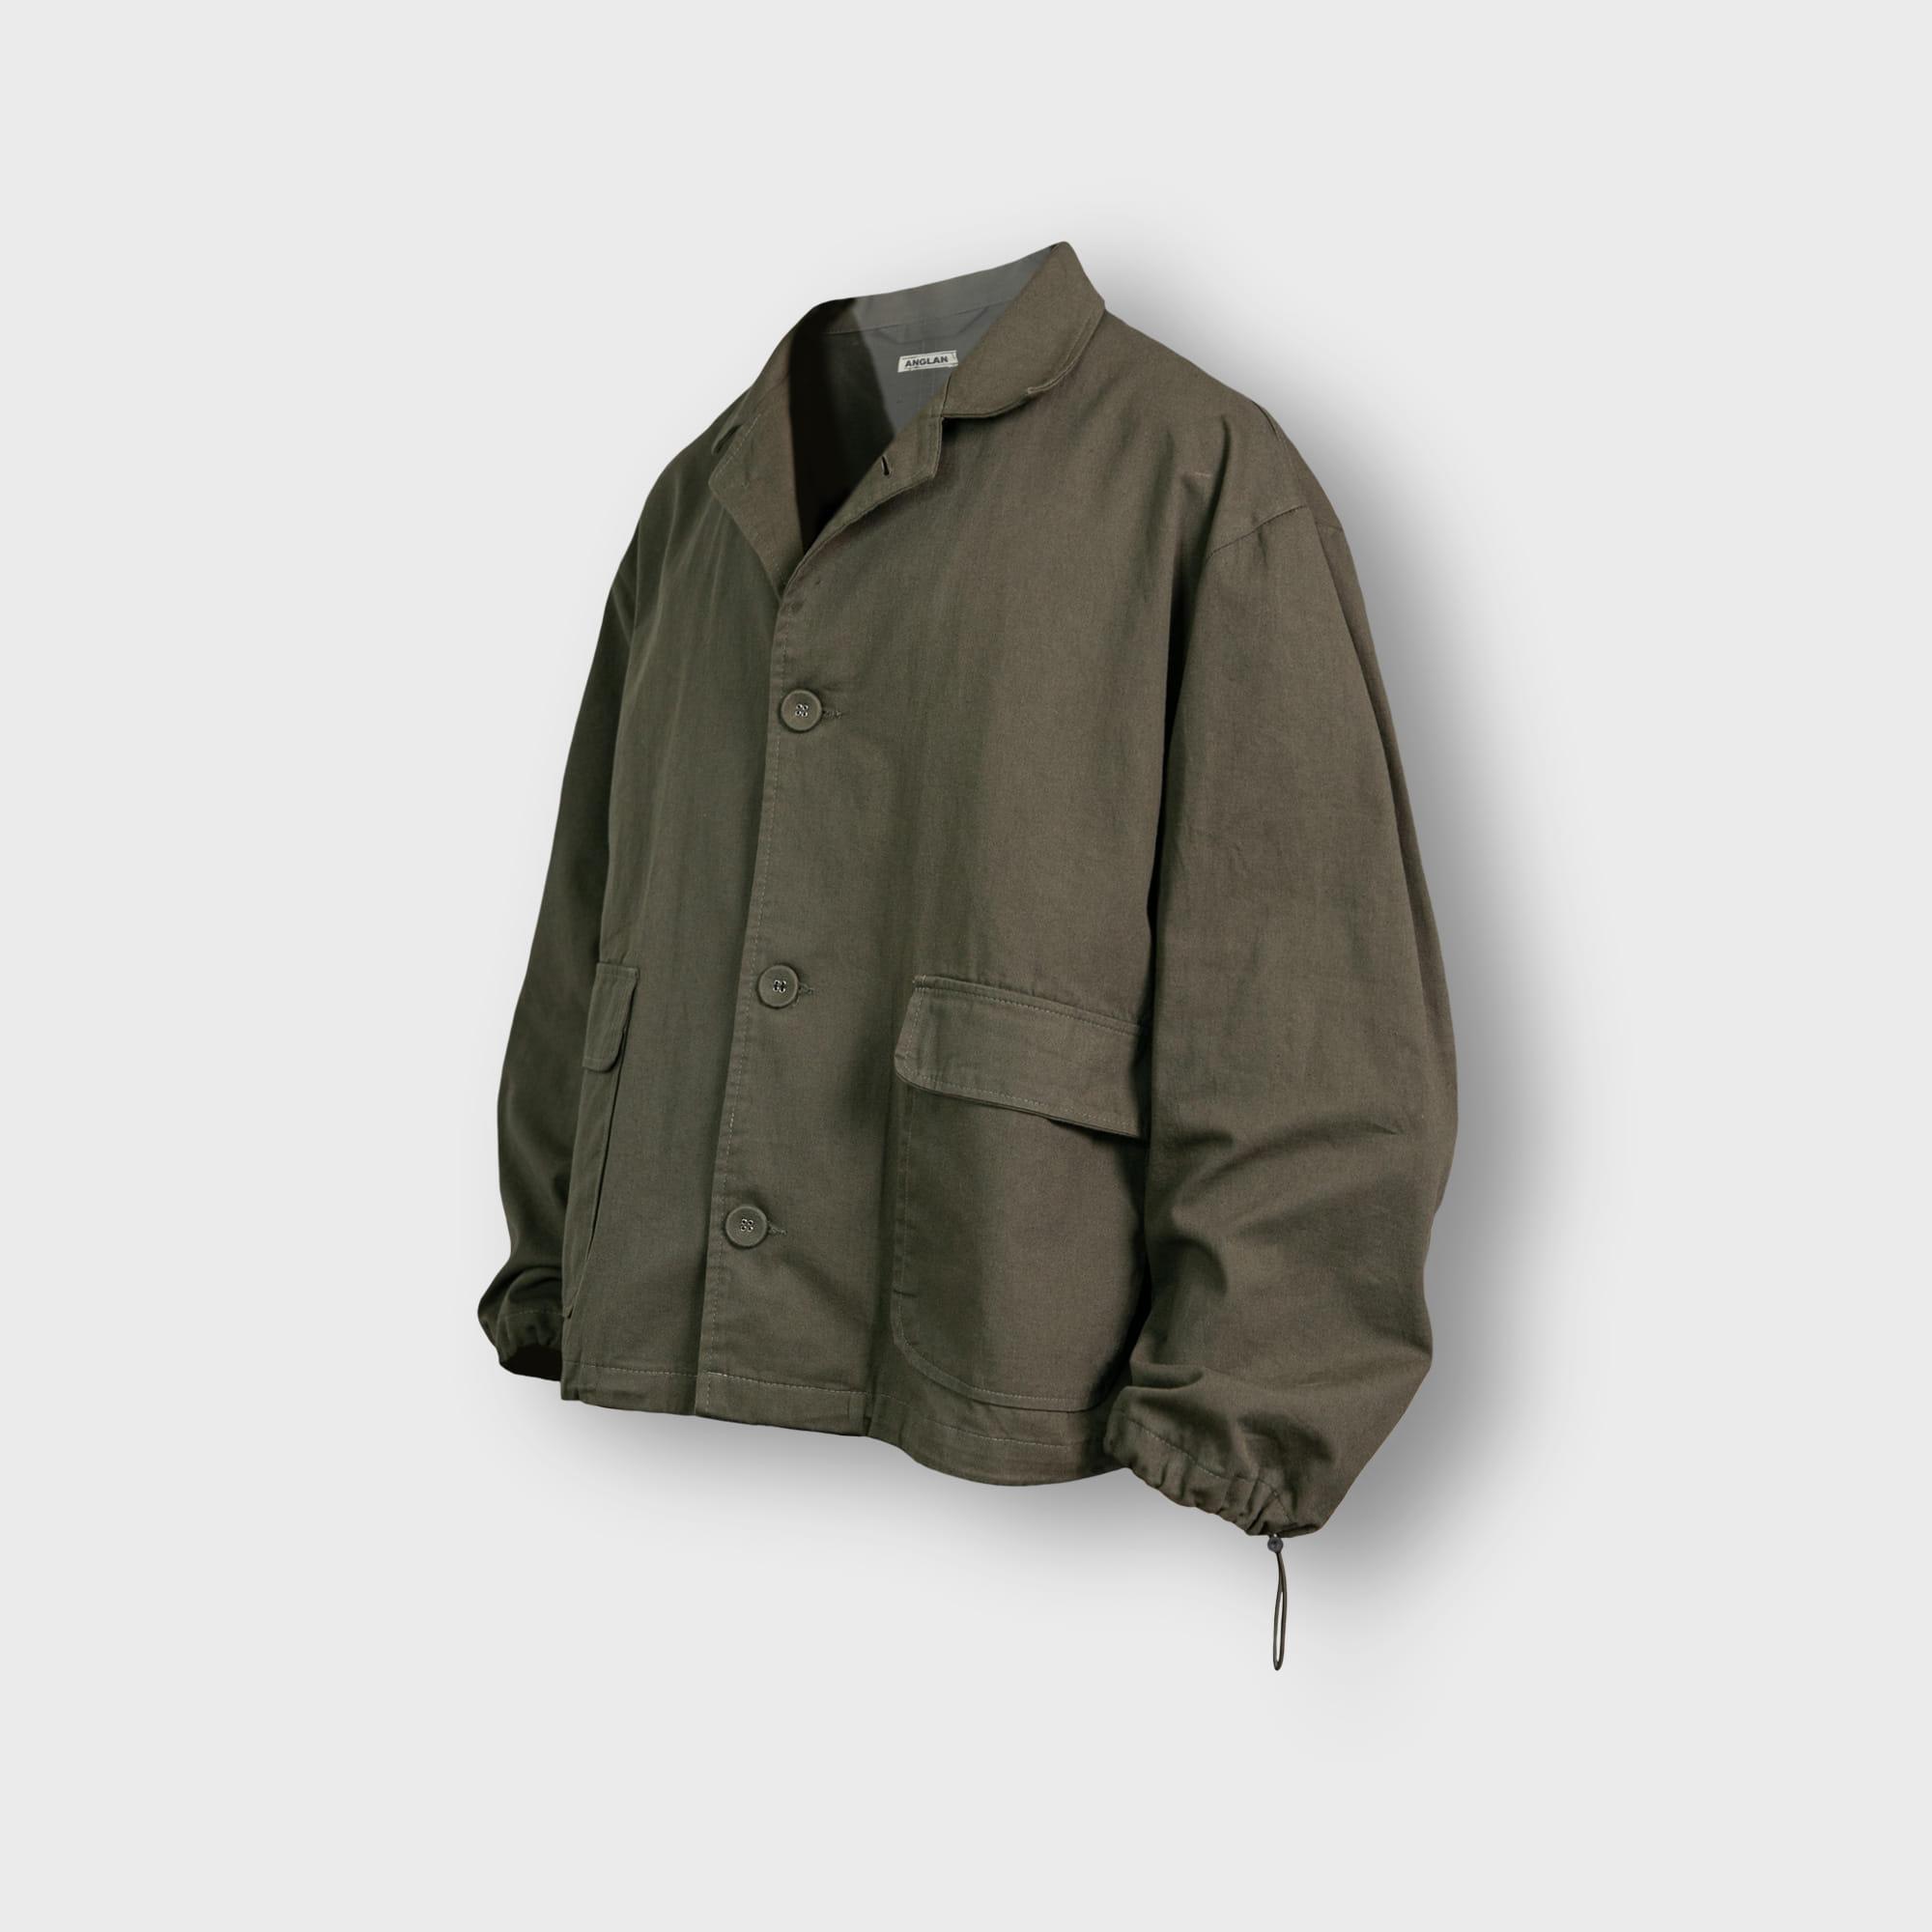 [AG] Twill Cotton String Shirt Jacket - Khaki